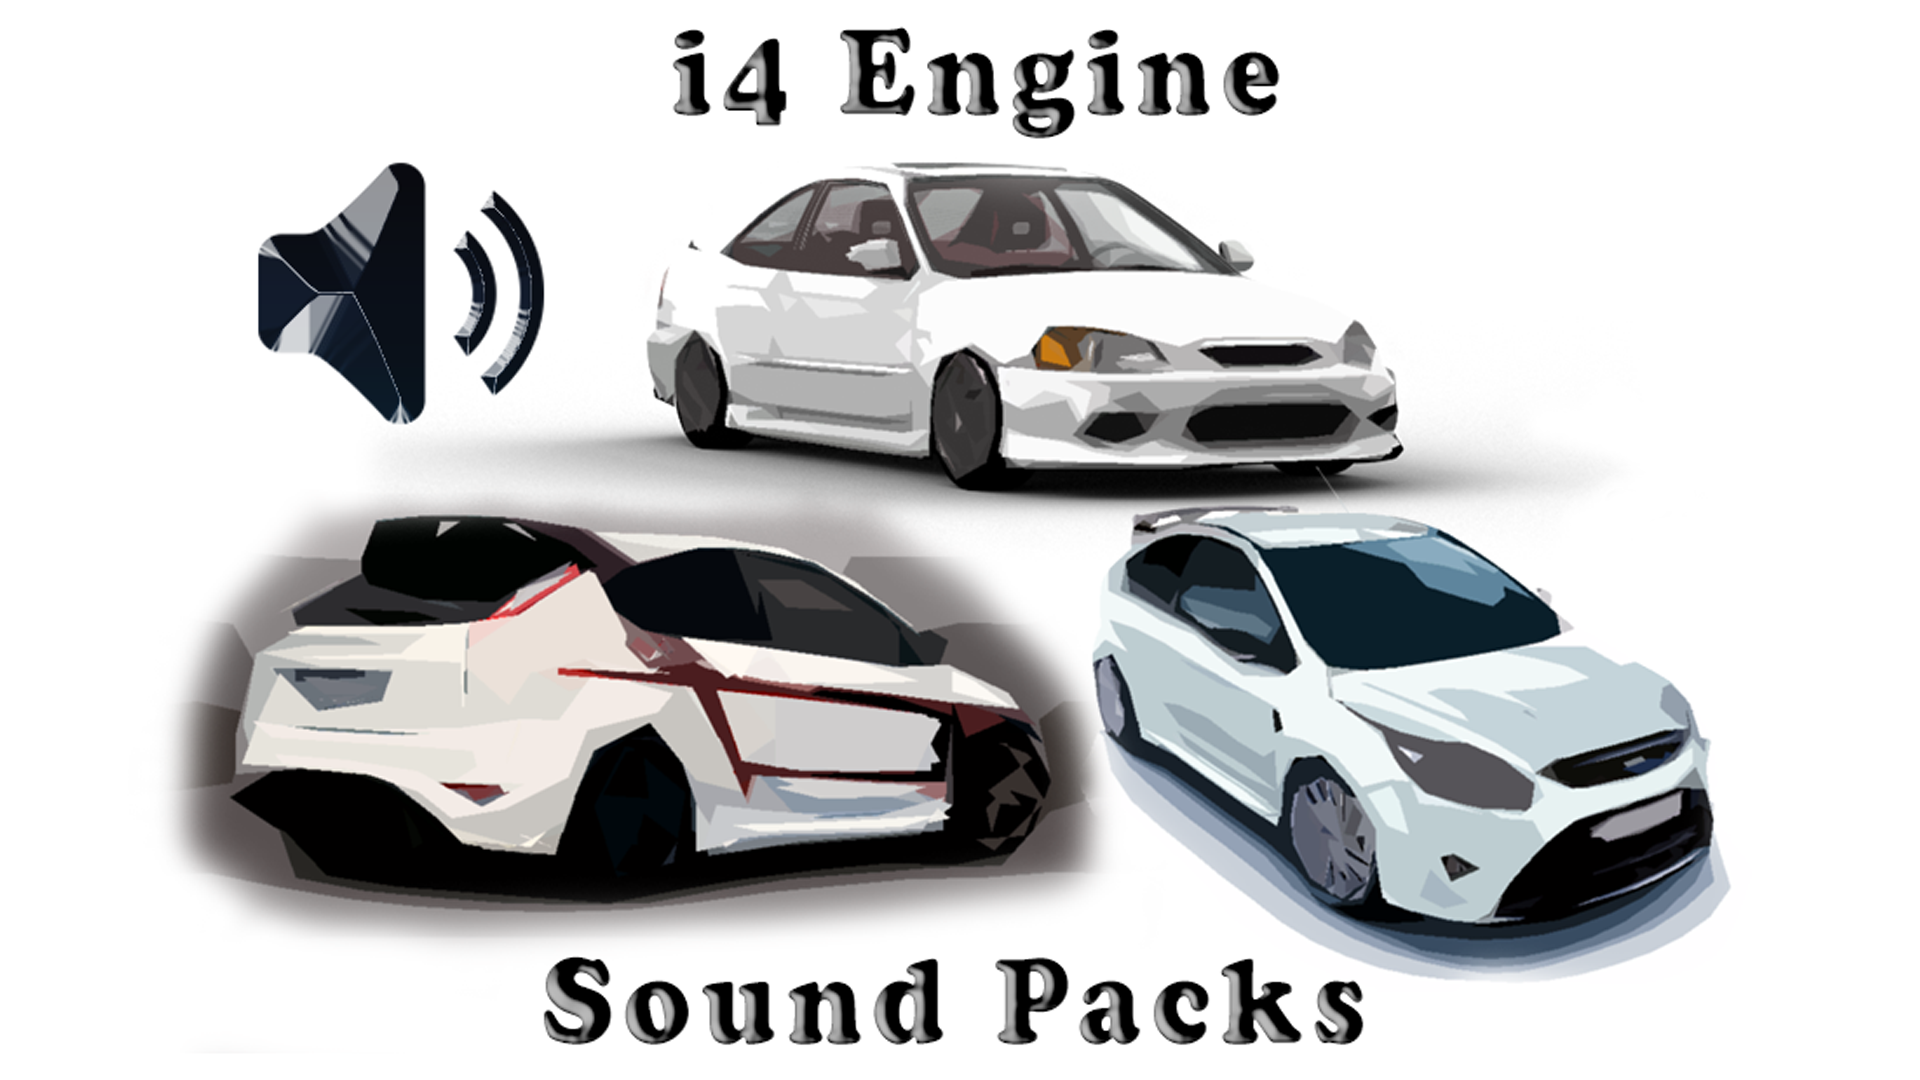 i4 Engine Sound Packs by slaczky - Skril Studio in Sound Effects